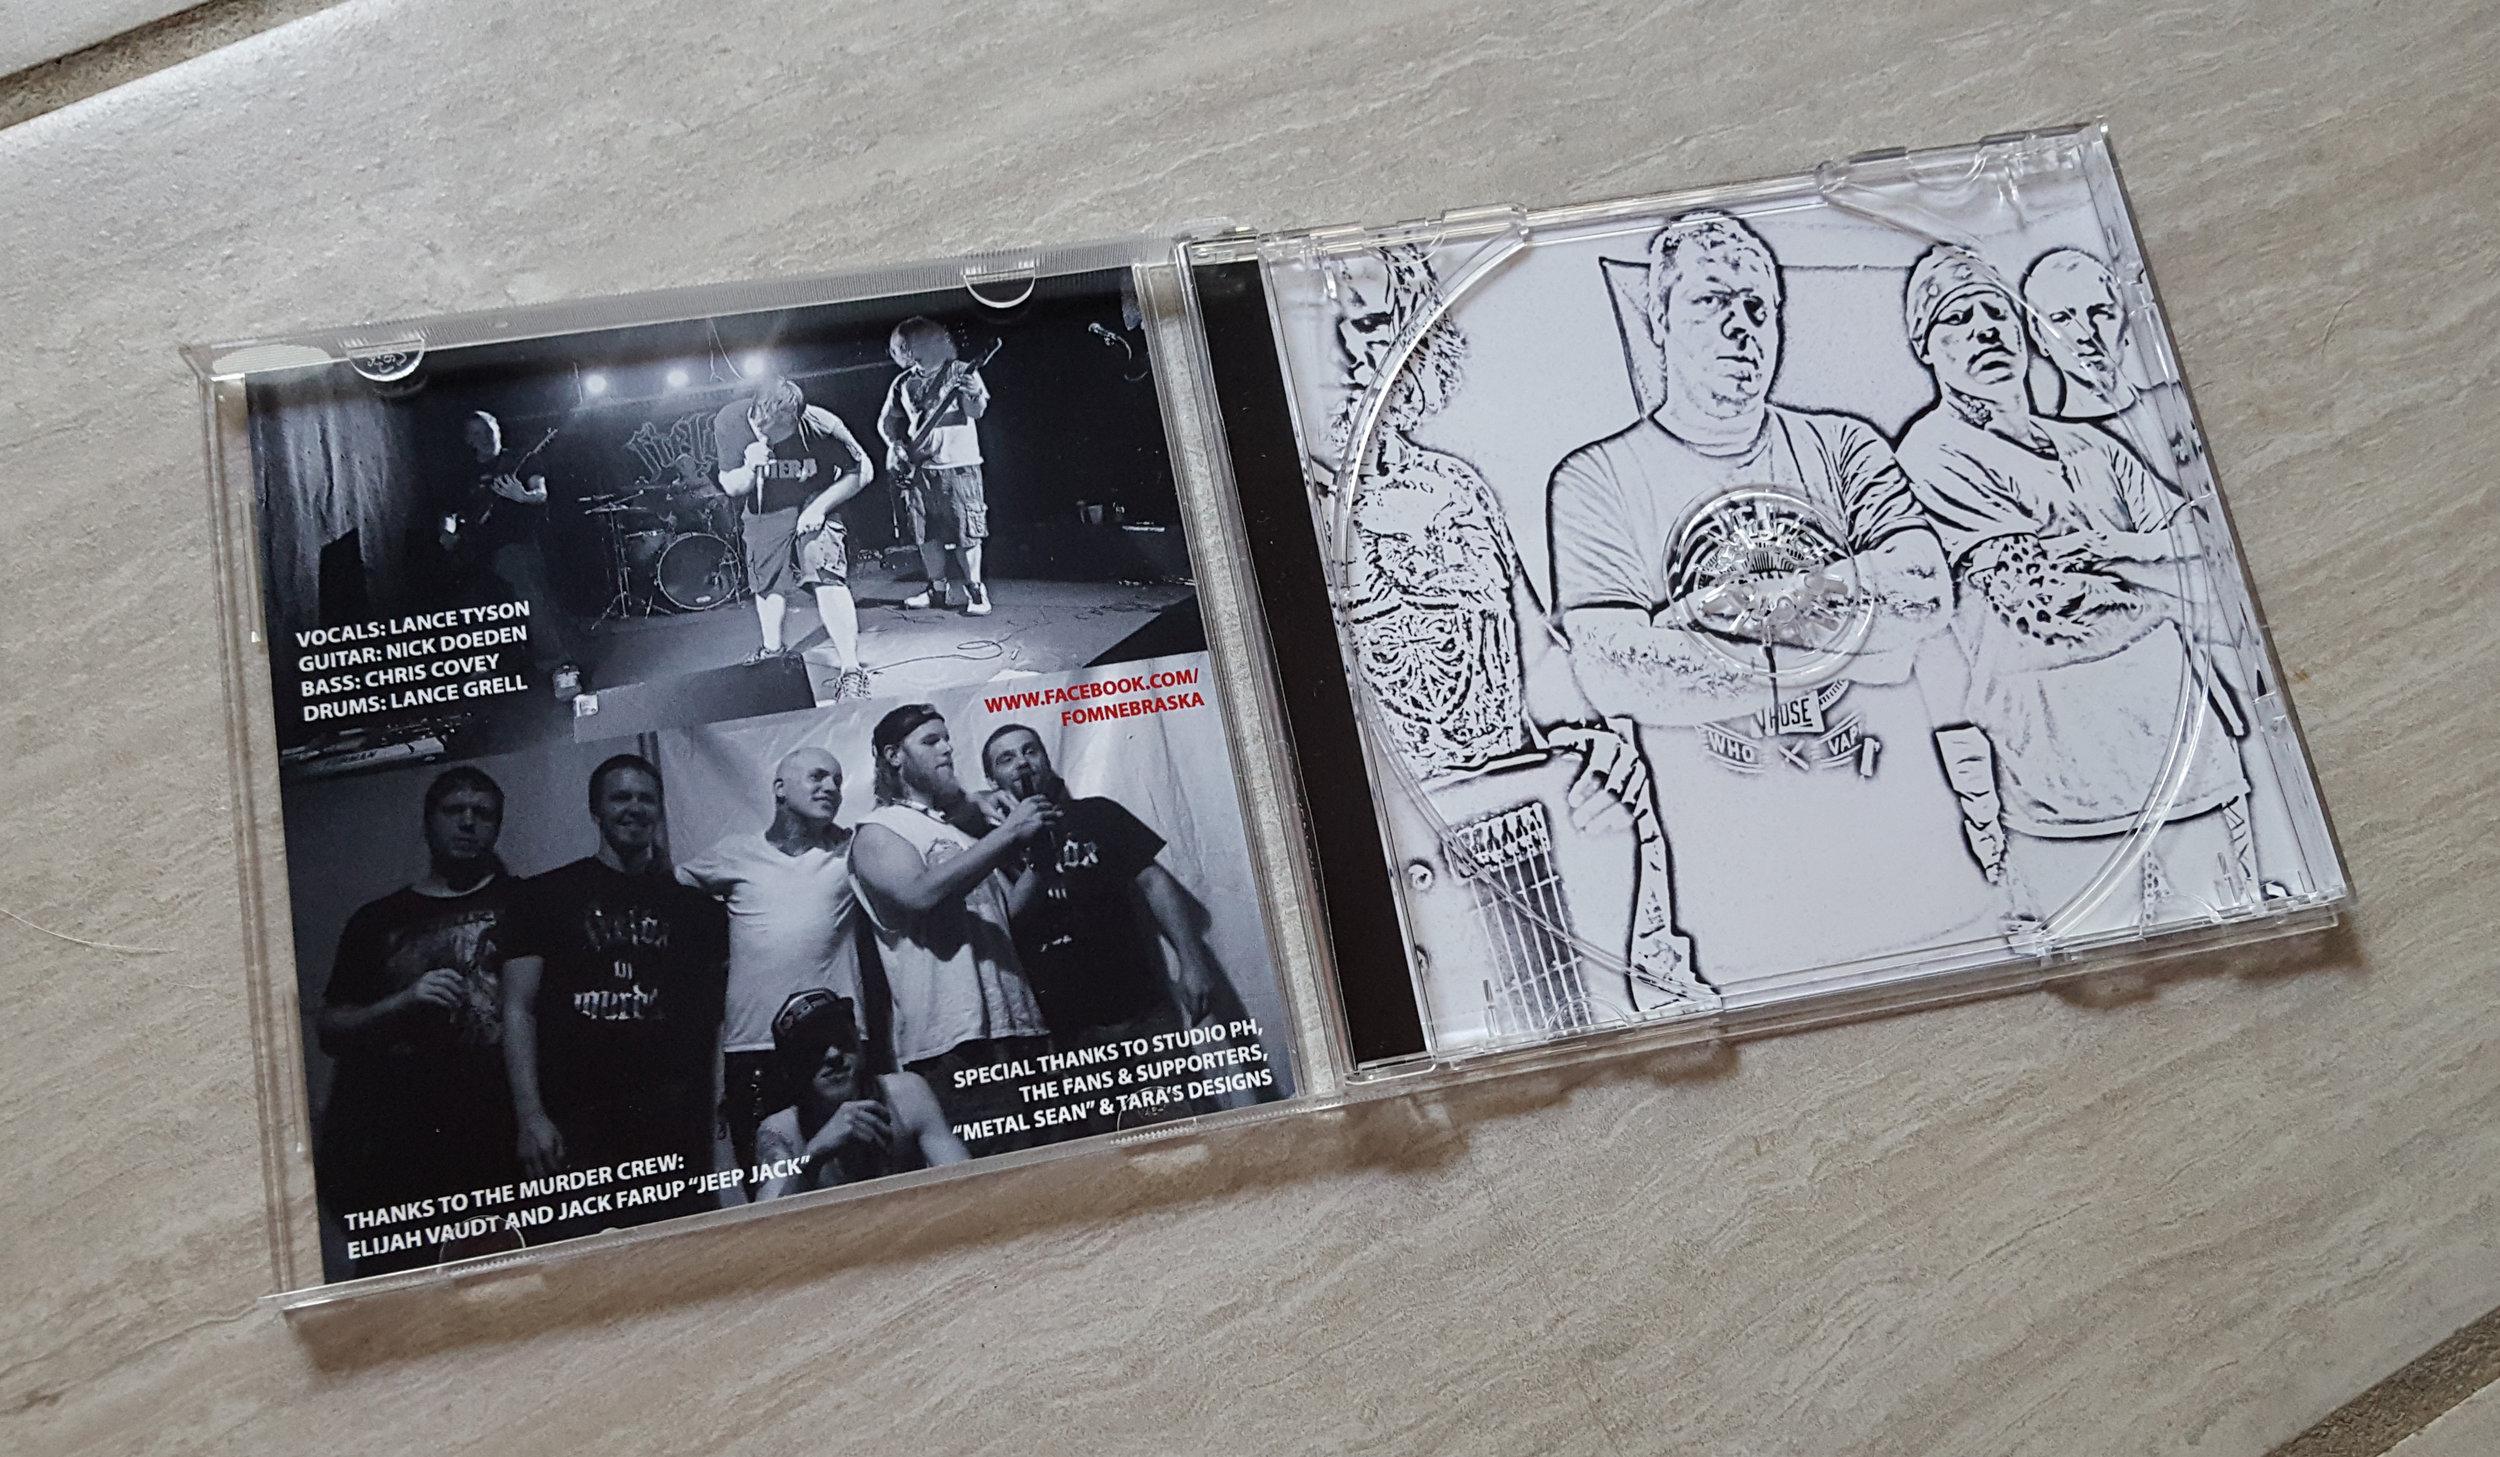 Fields of Murder band CD